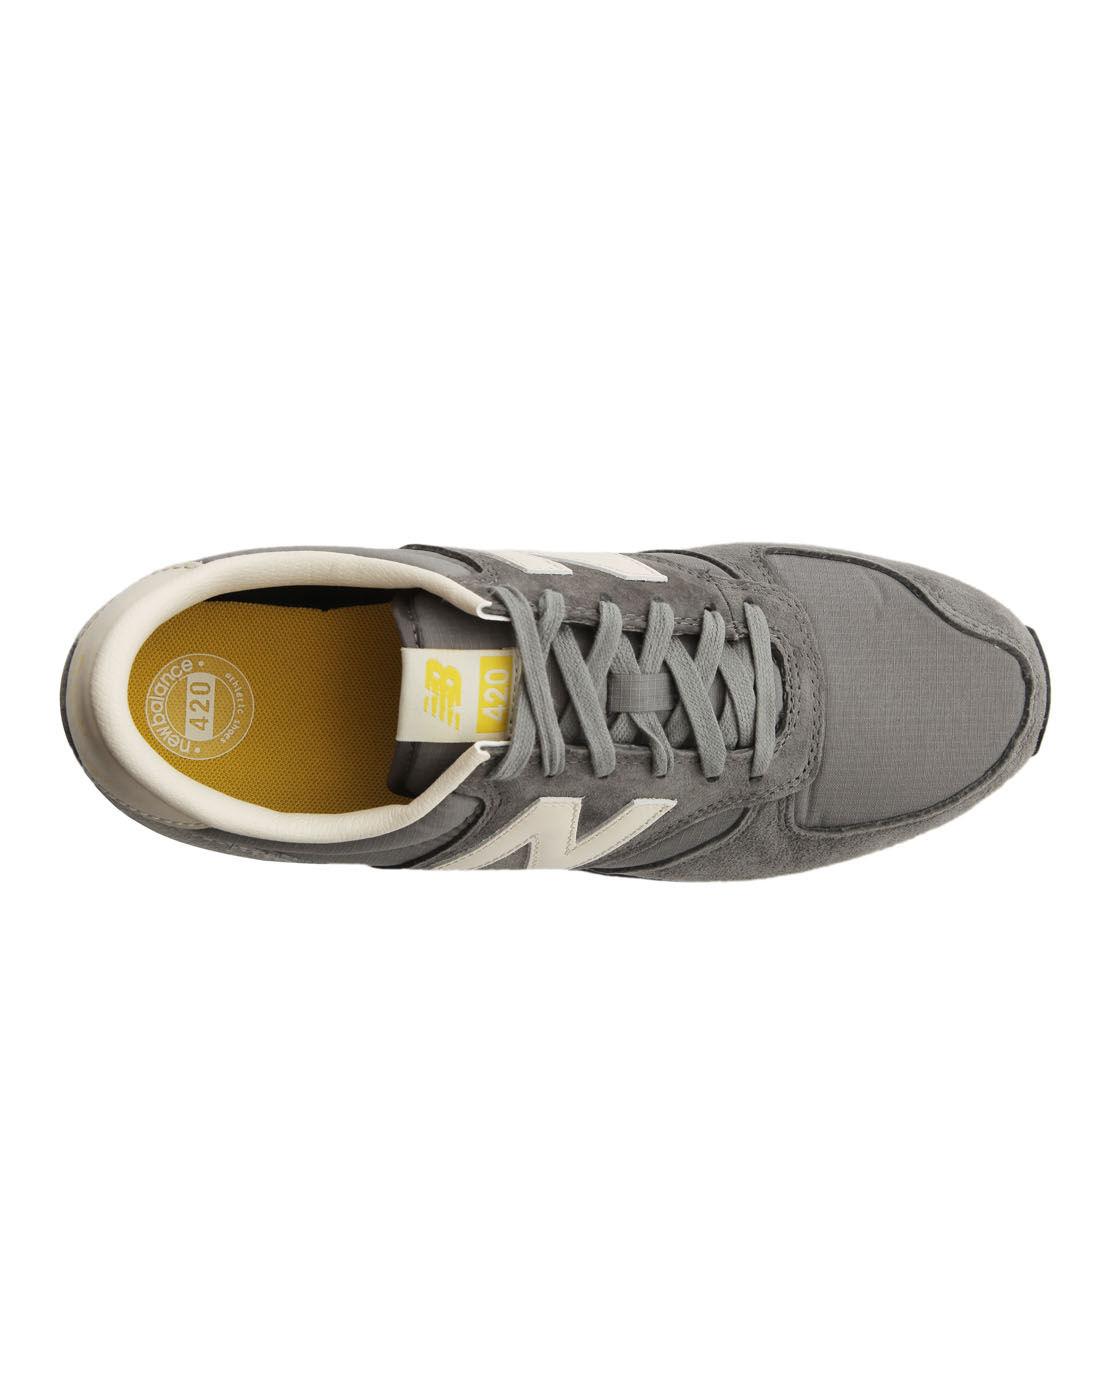 new balance 420 grey yellow